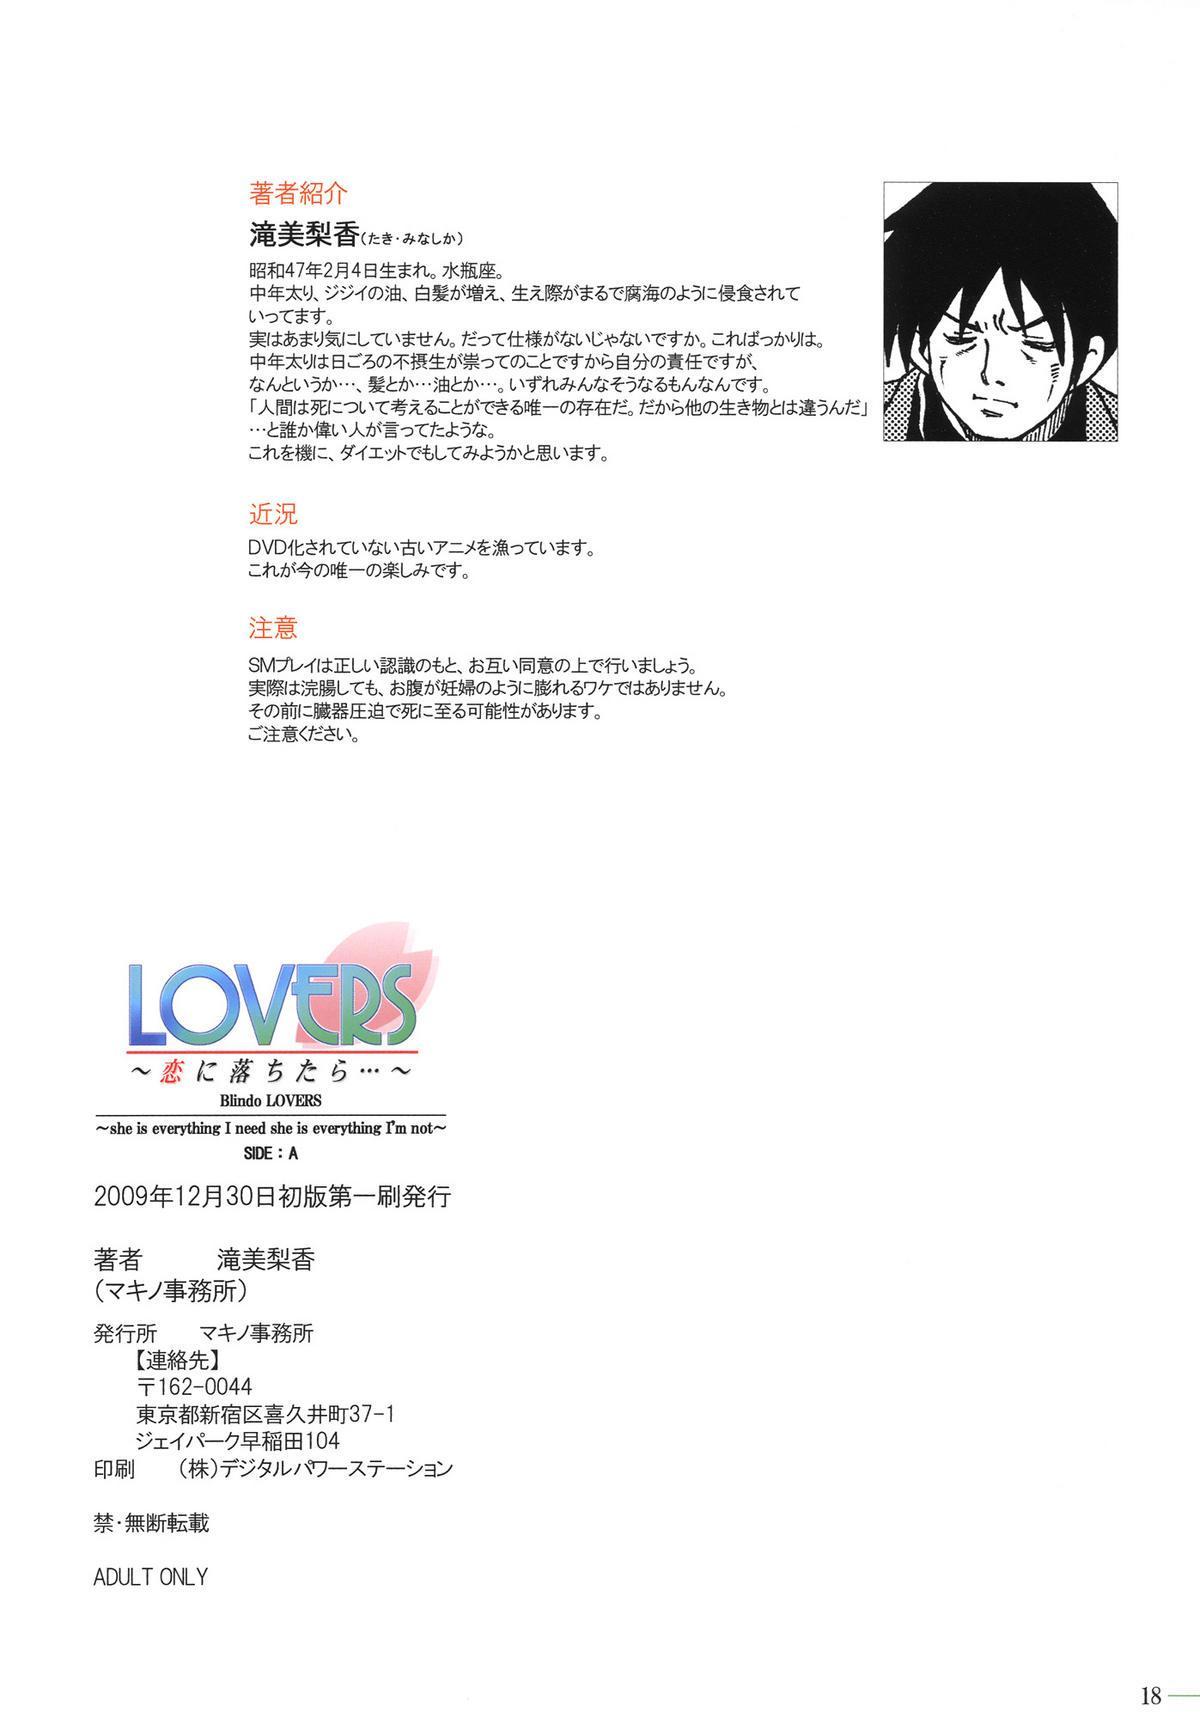 (C77) [Makino Jimusho (Taki Minashika)] LOVERS ~Koi ni Ochitara... ~Blindo LOVERS ~she is everything I need she is everything I'm not~ SIDE:A 16